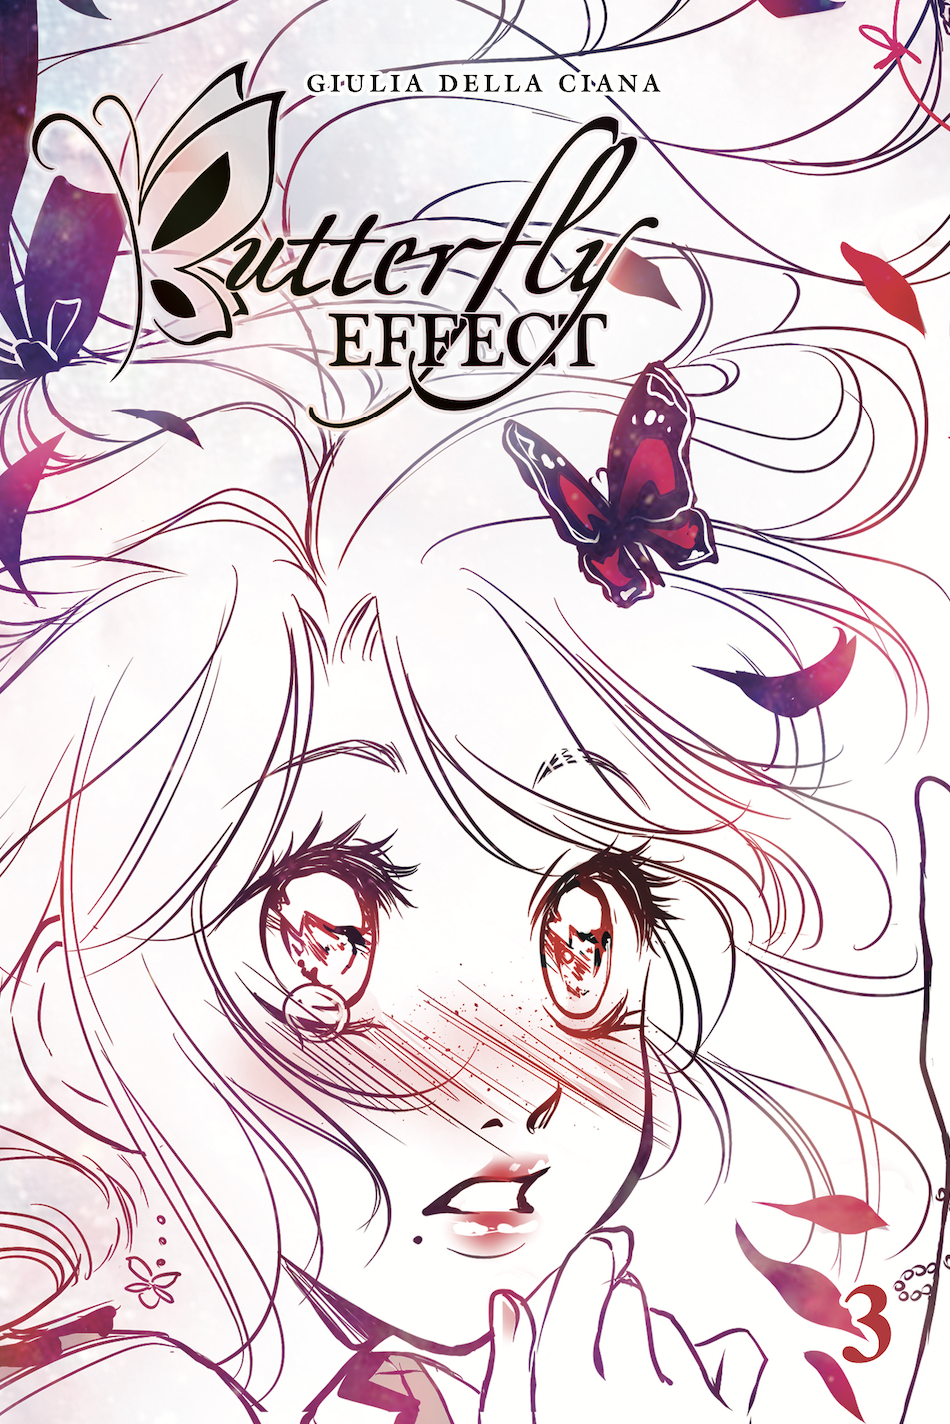 COPERTINA cofanetto 3 Butterfly Effect